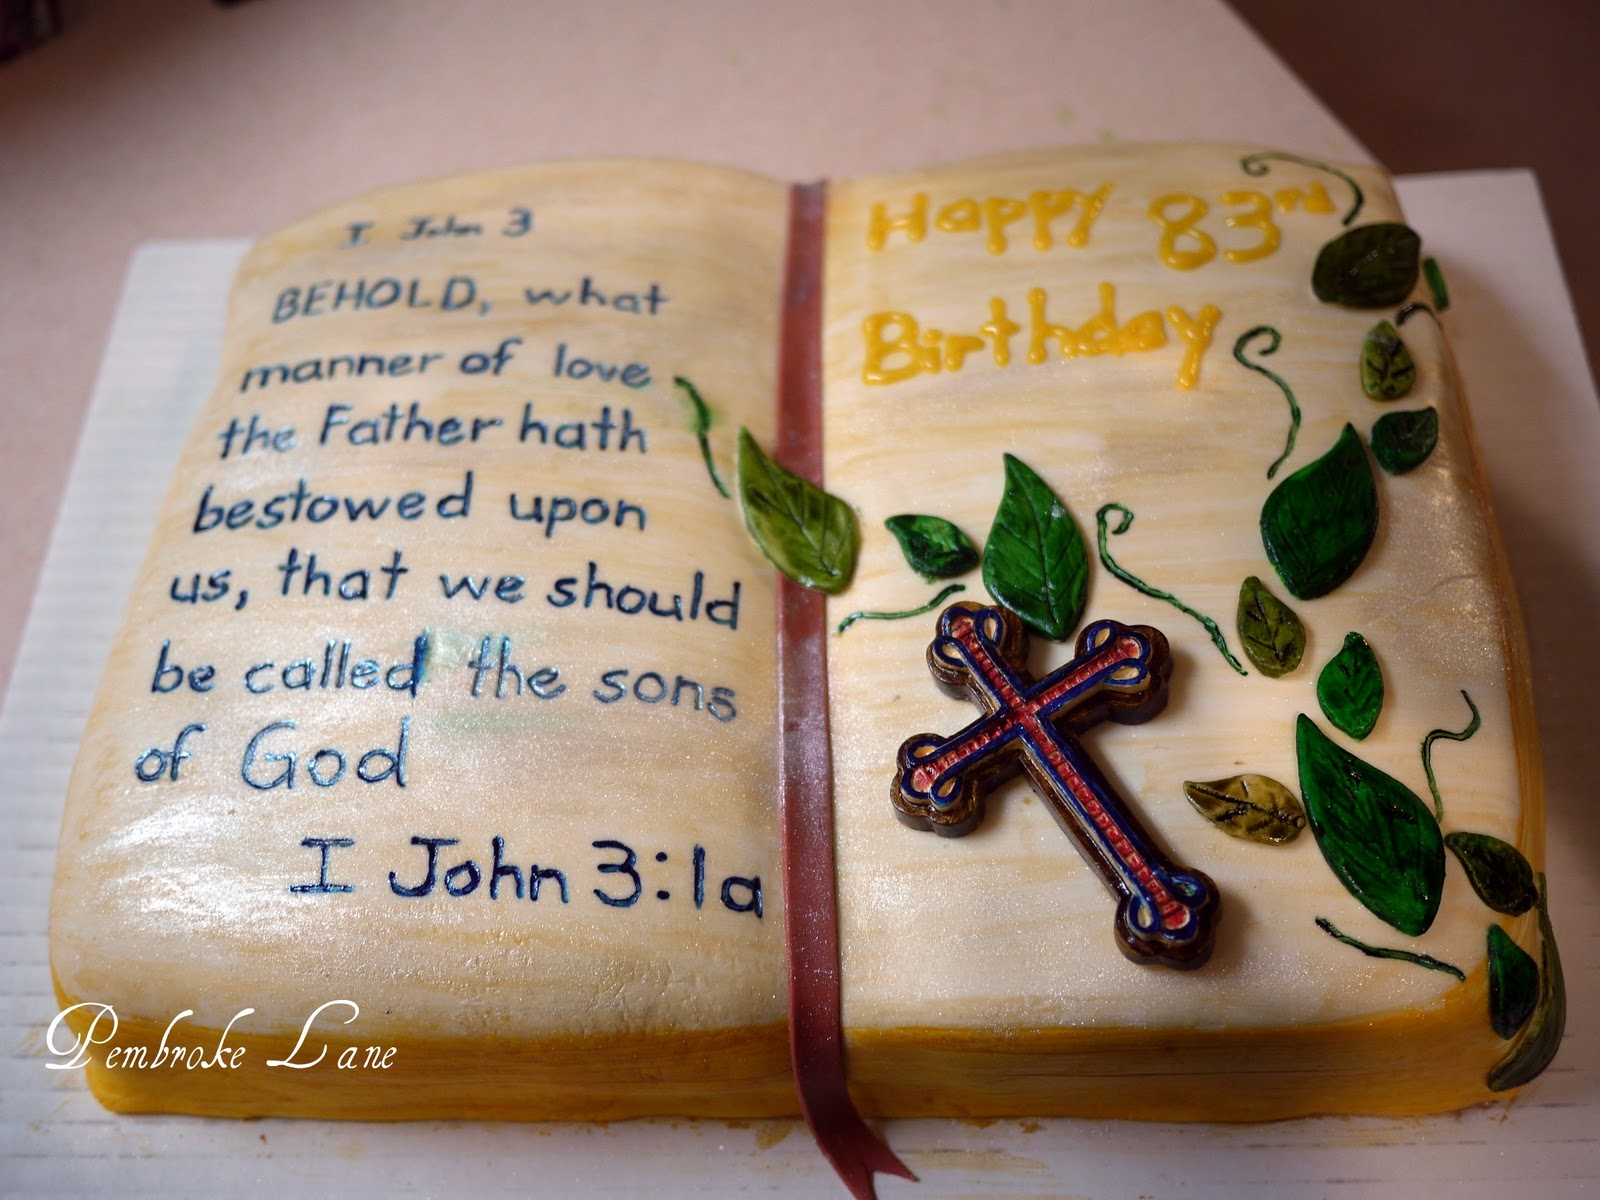 Pembroke Lane Bible Cake For Pastors Birthday